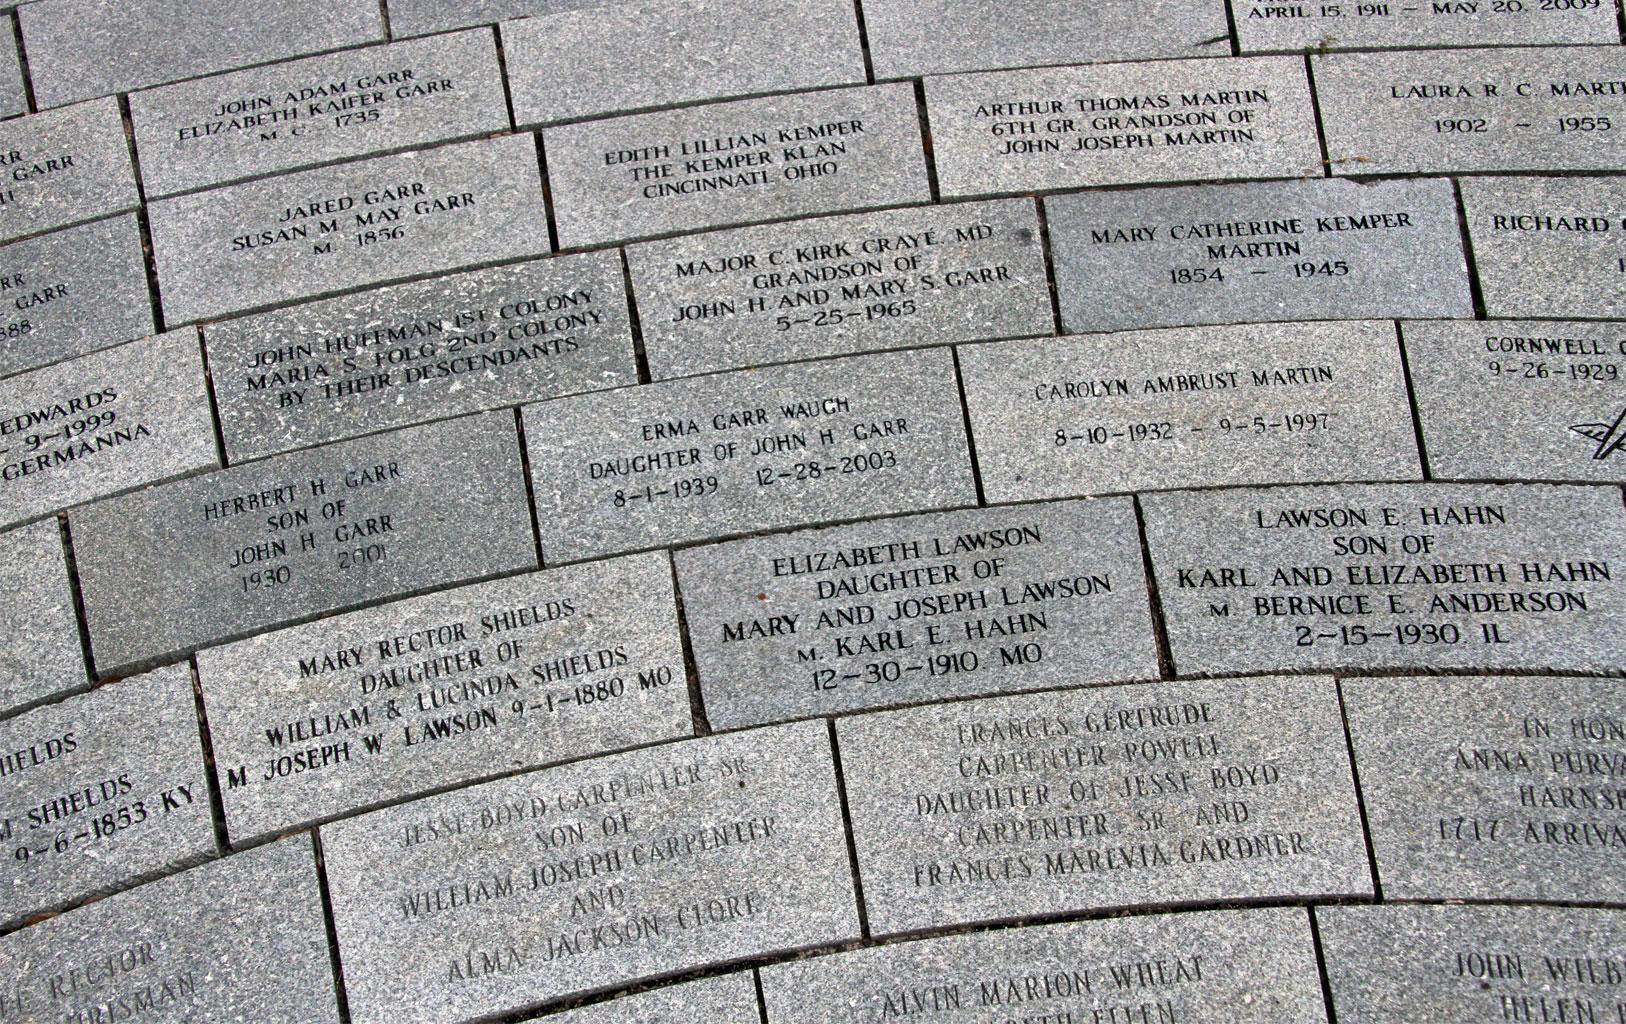 Order Engraved Stone Pavers for Germanna Memorial Garden